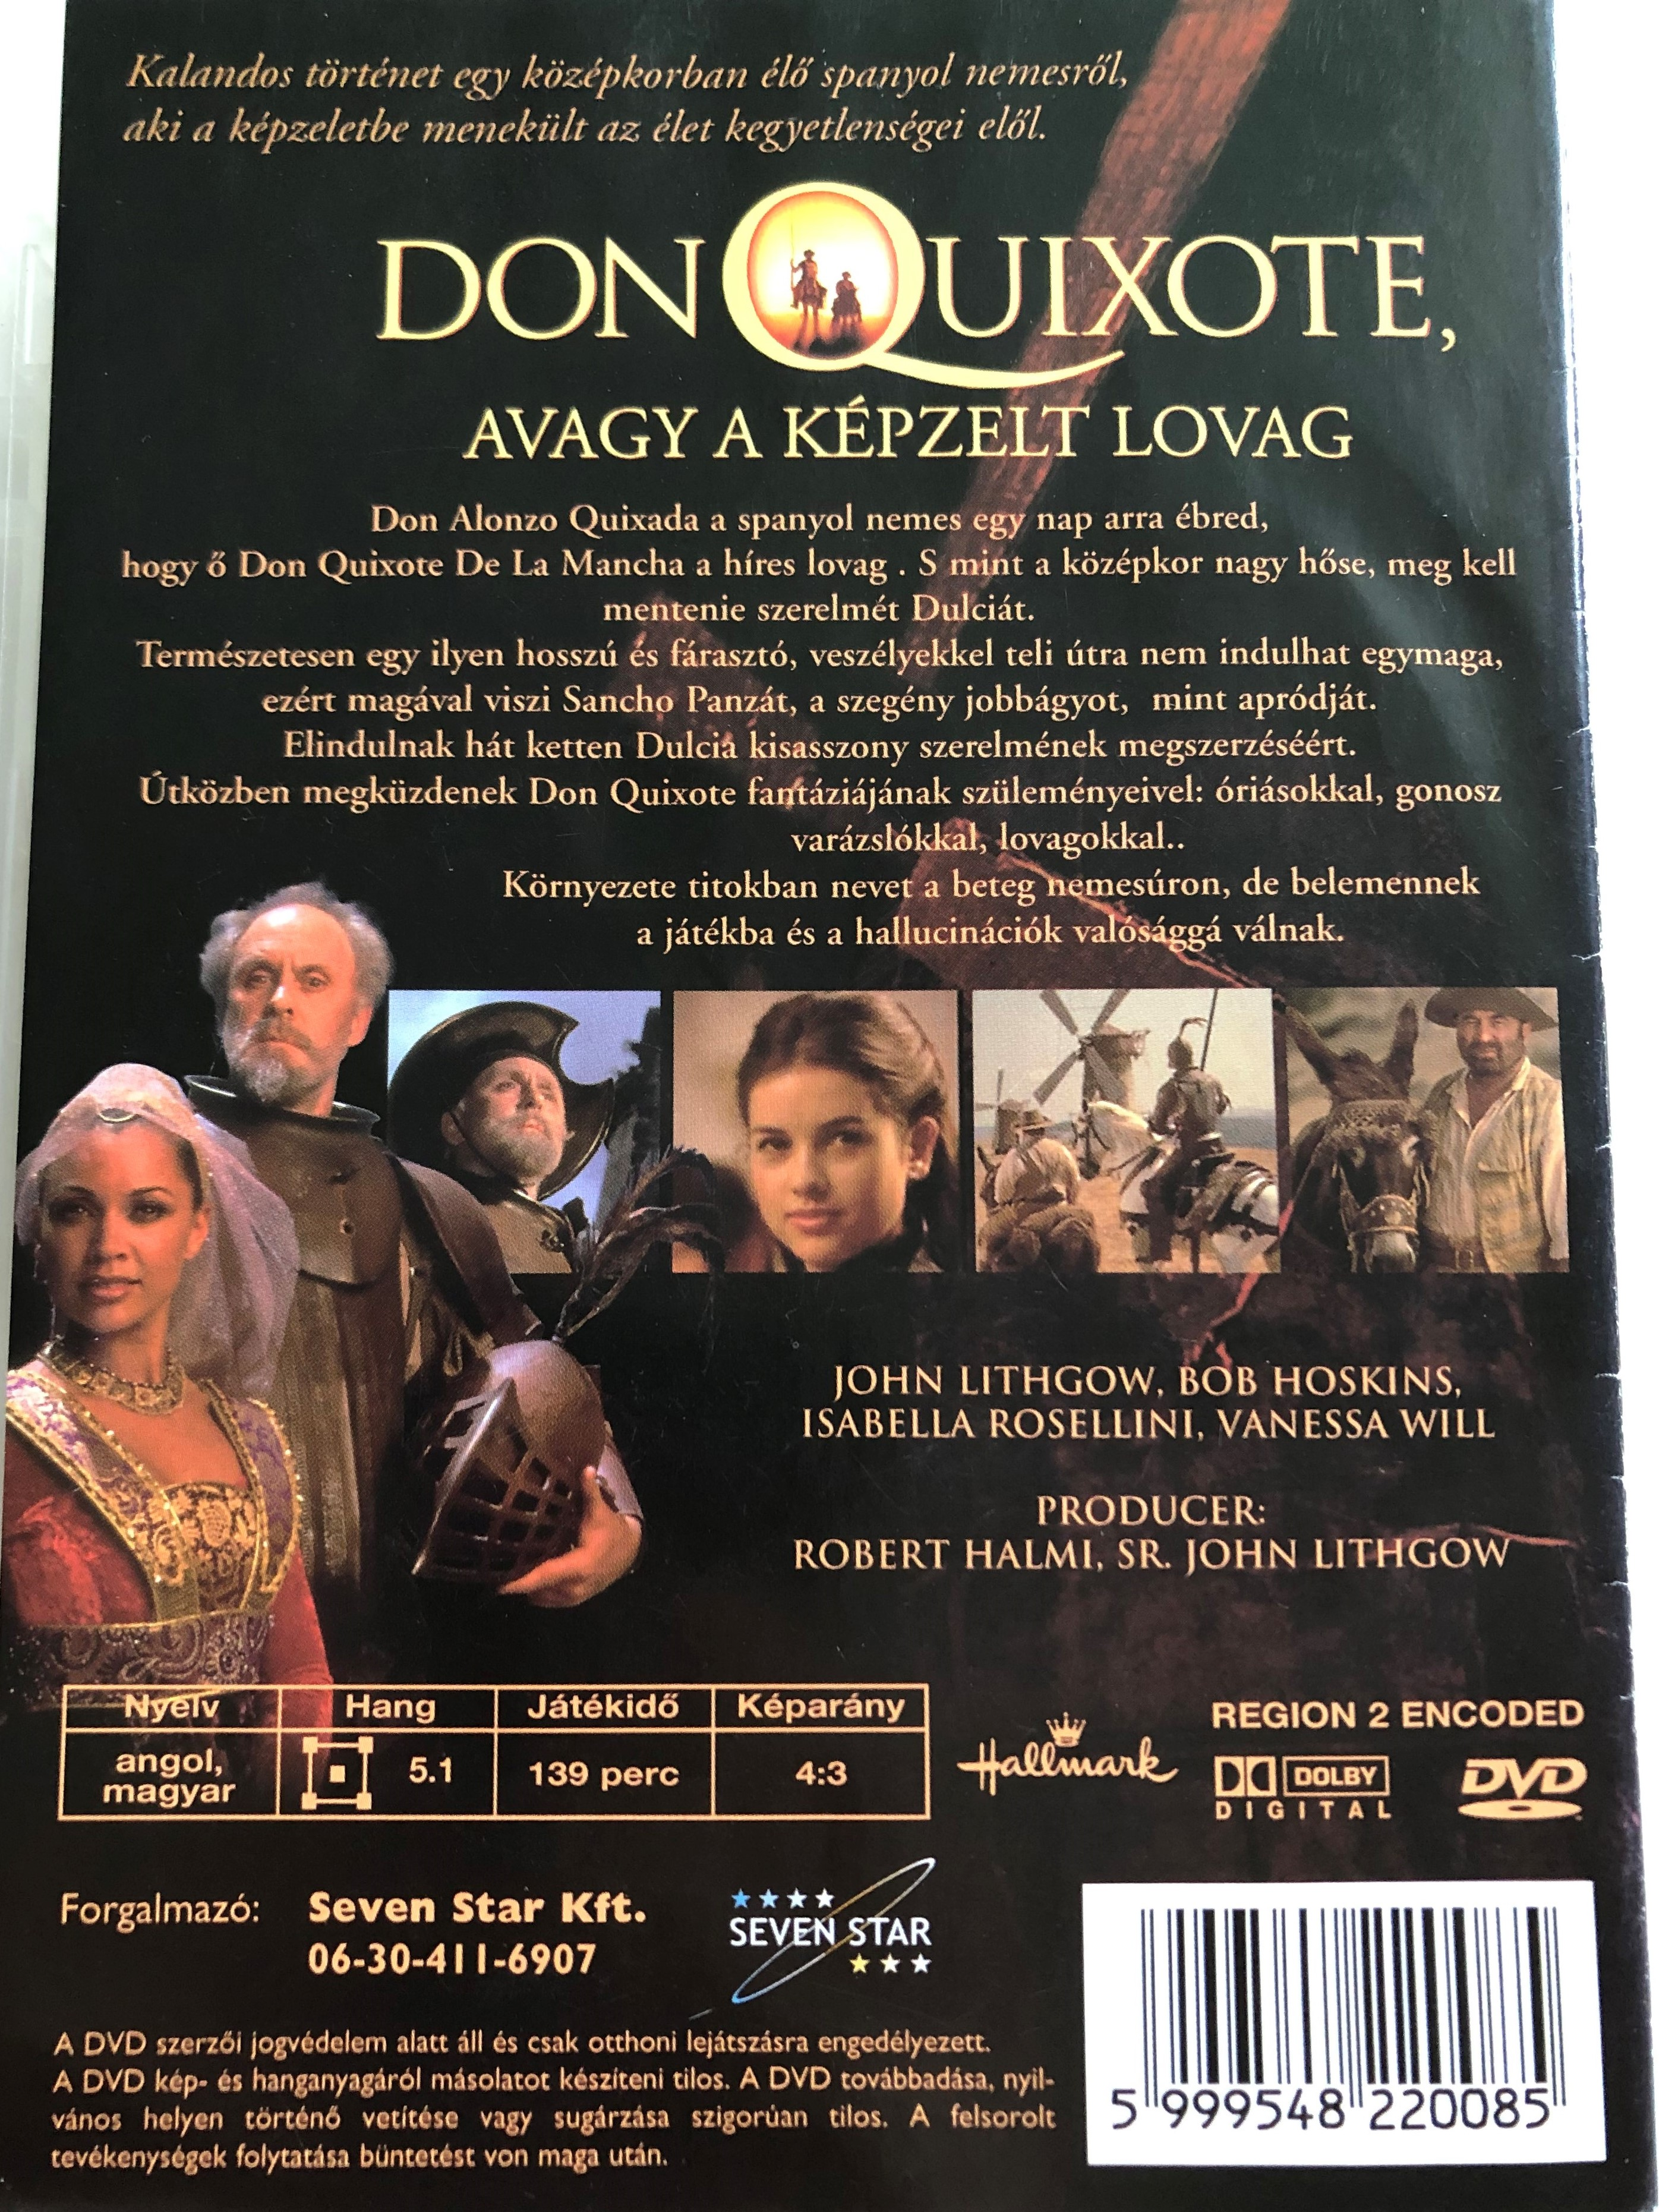 don-quixote-dvd-2000-don-quixote-avagy-a-k-pzelt-lovag-directed-by-peter-yates-starring-john-lithgow-bob-hoskins-isabella-rossellini-lambert-wilson-2-.jpg